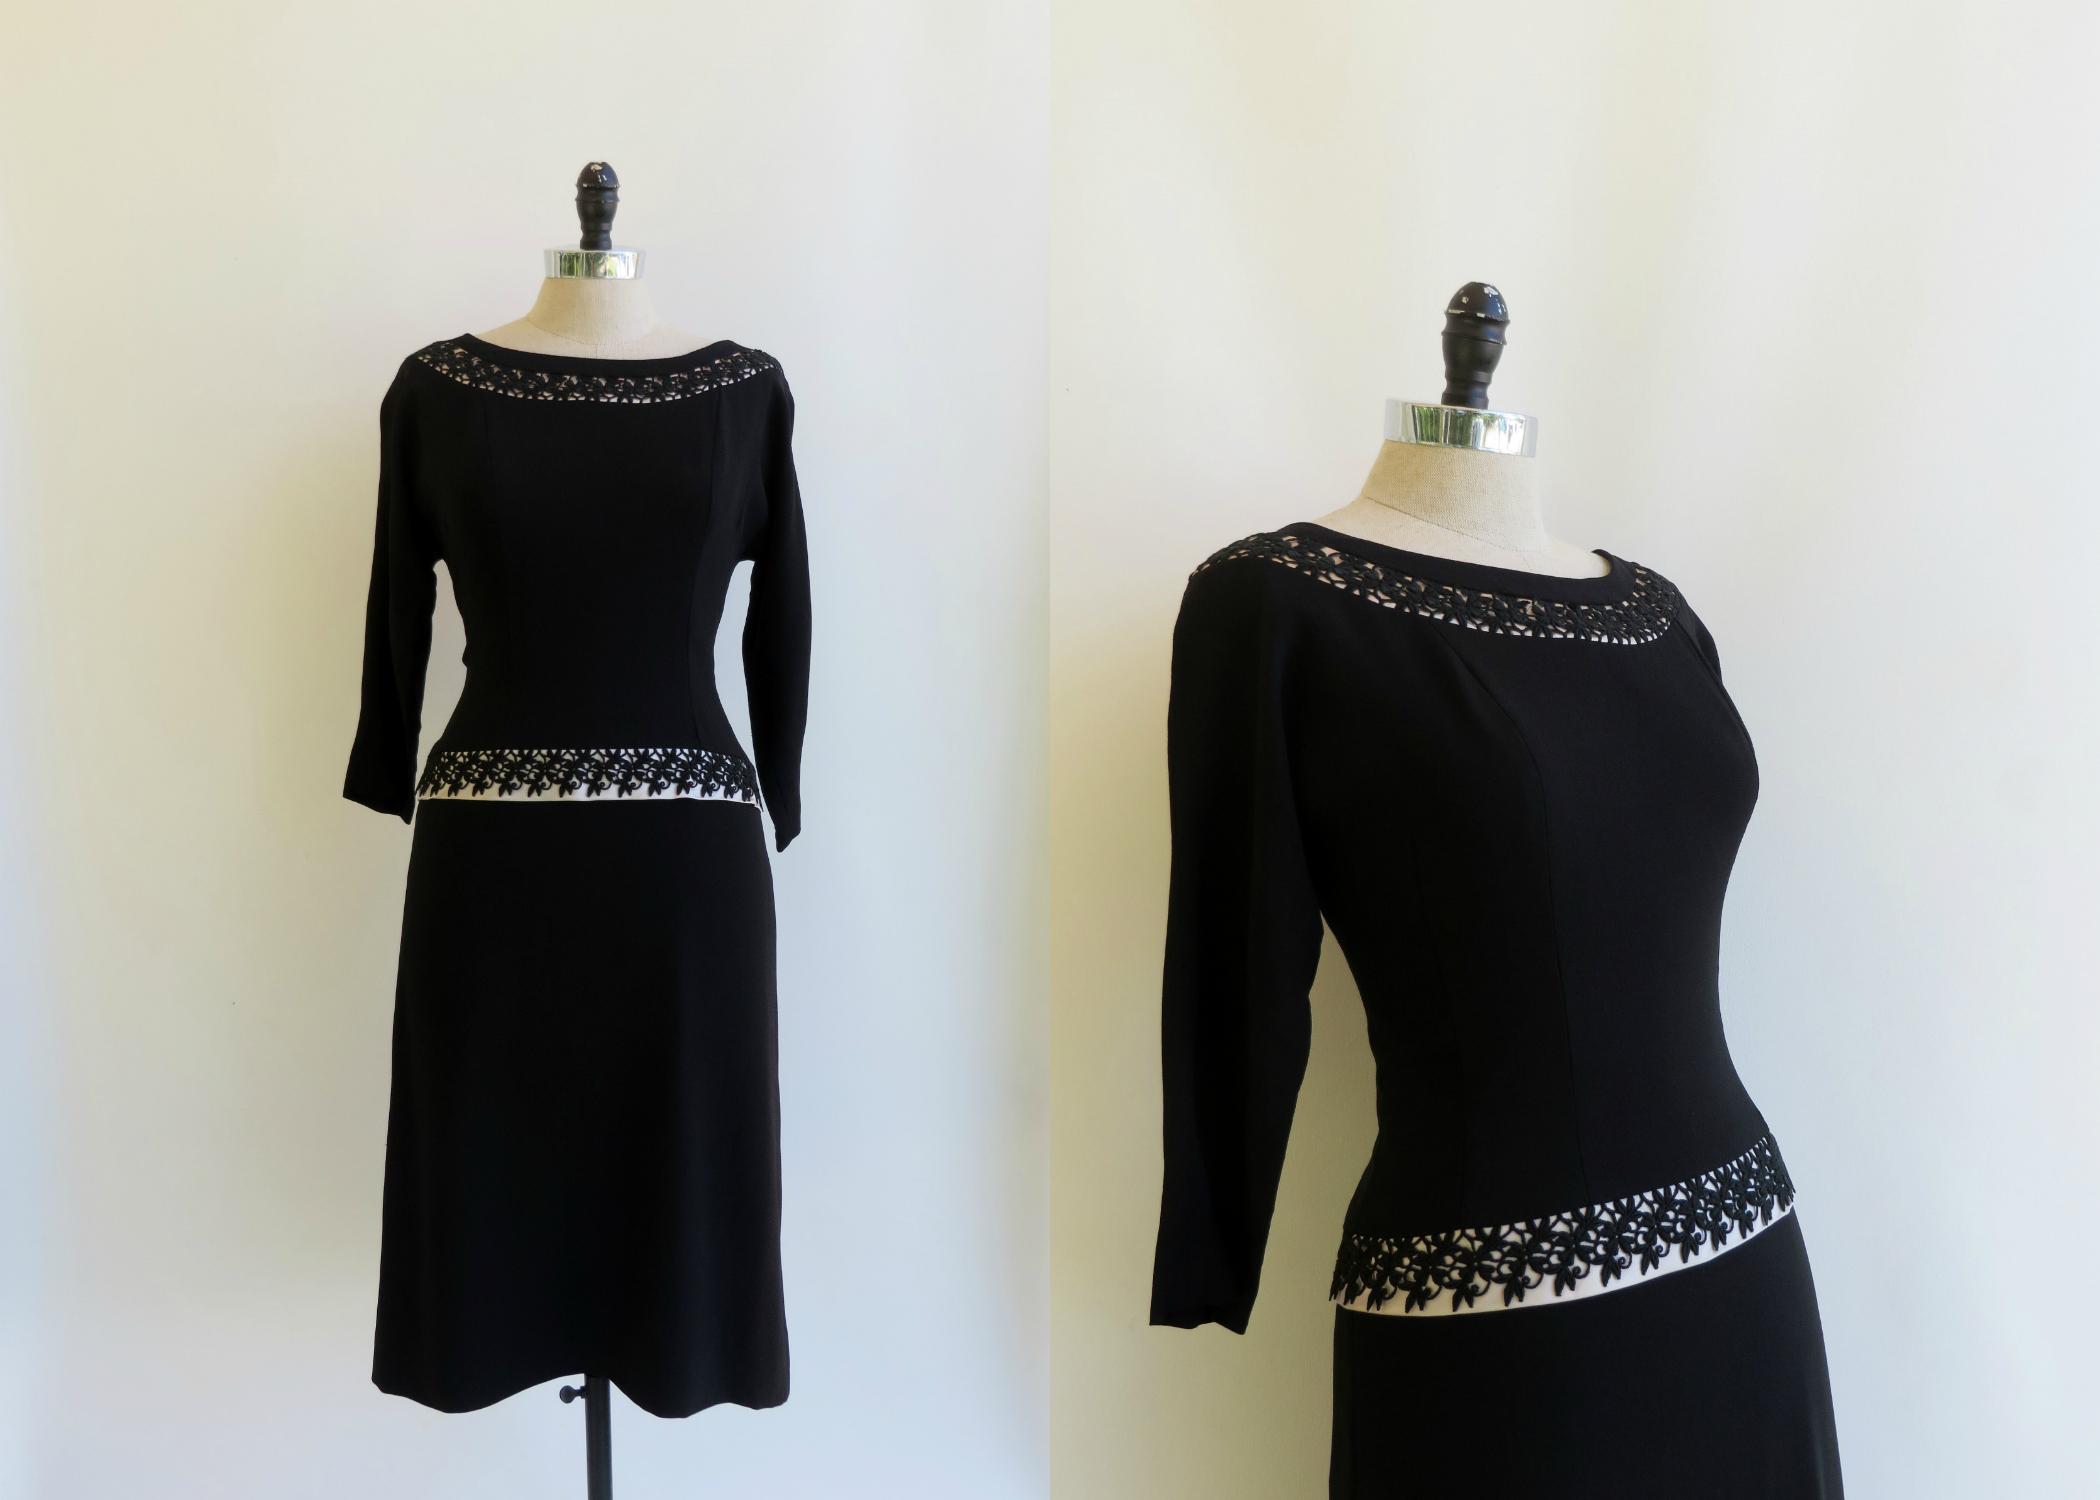 1950's little black dress with white satin & black lace details